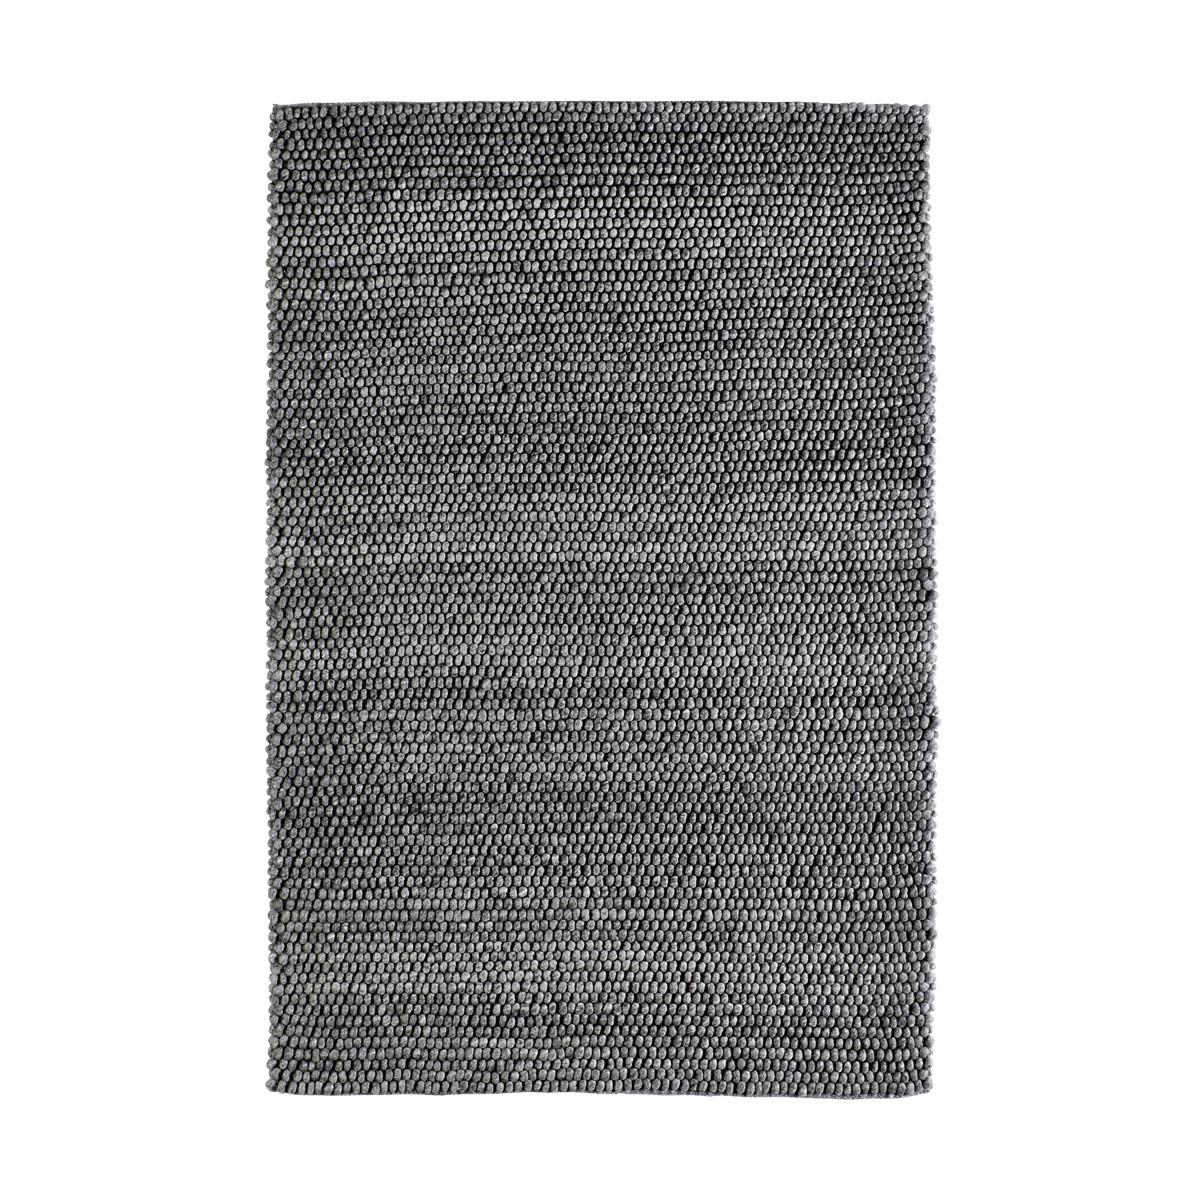 Ručně tkaný kusový koberec Loft 580 GRAPHITE c7c2a12b7f